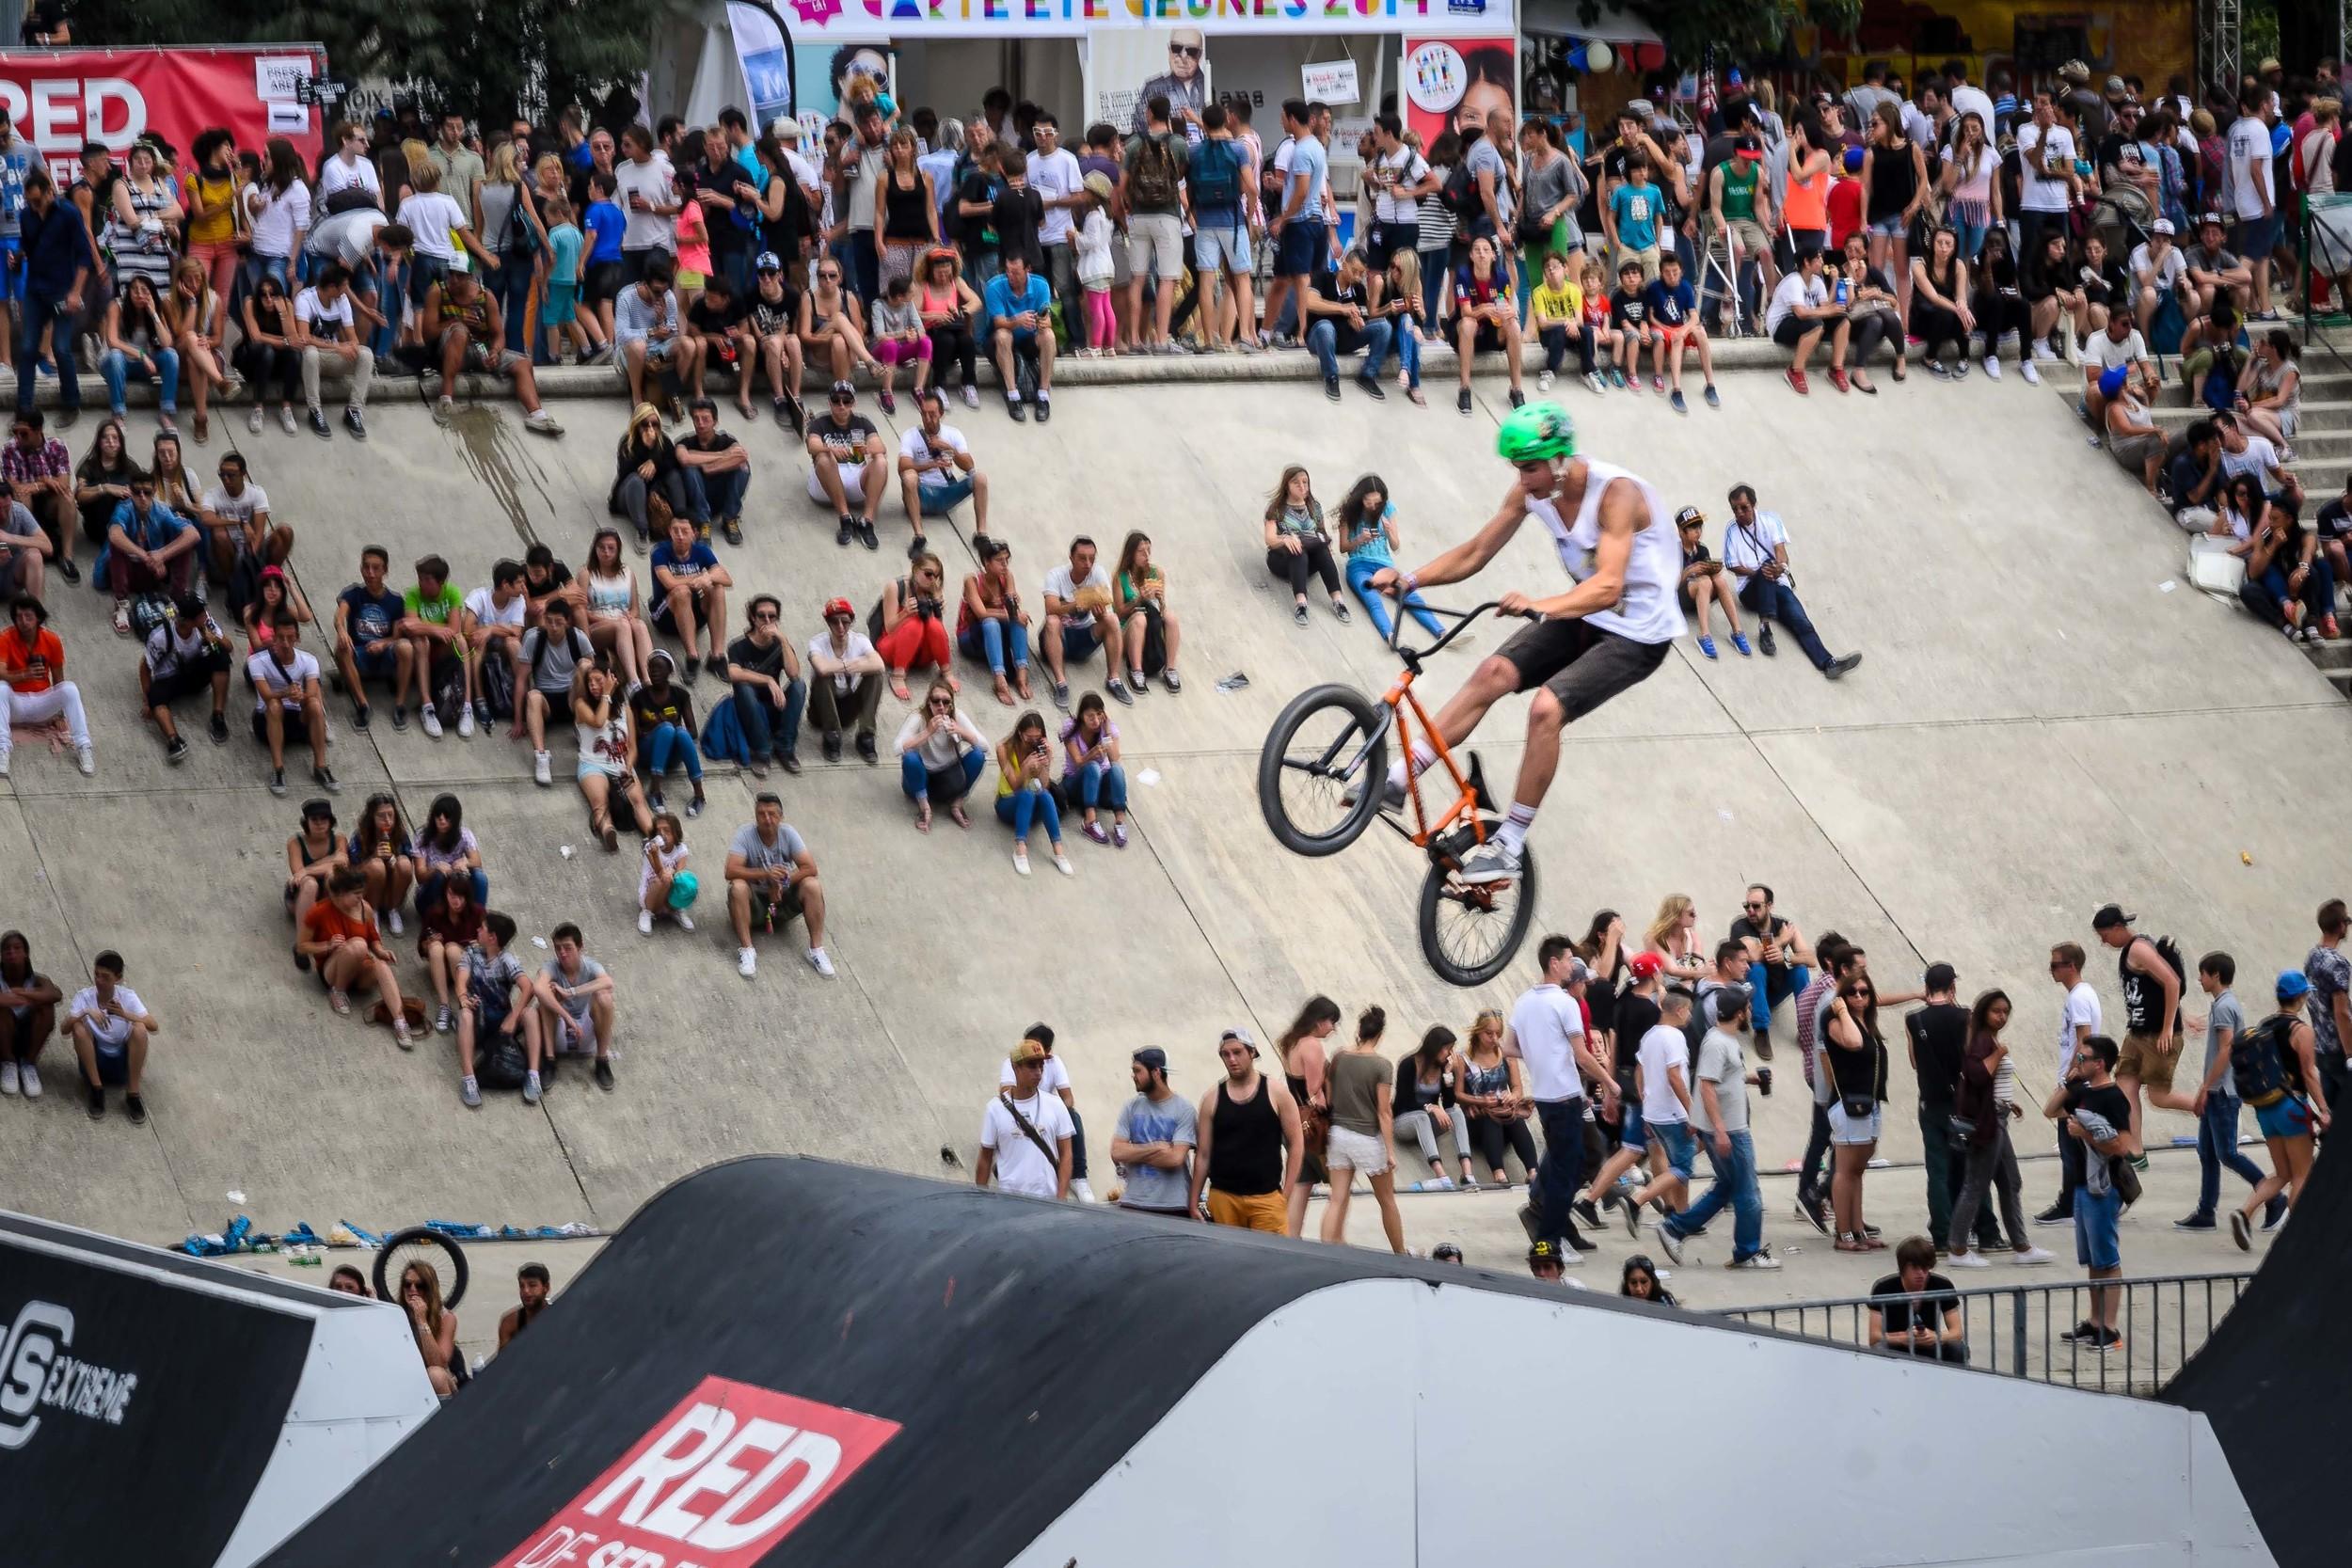 FISE 2014, Montpellier